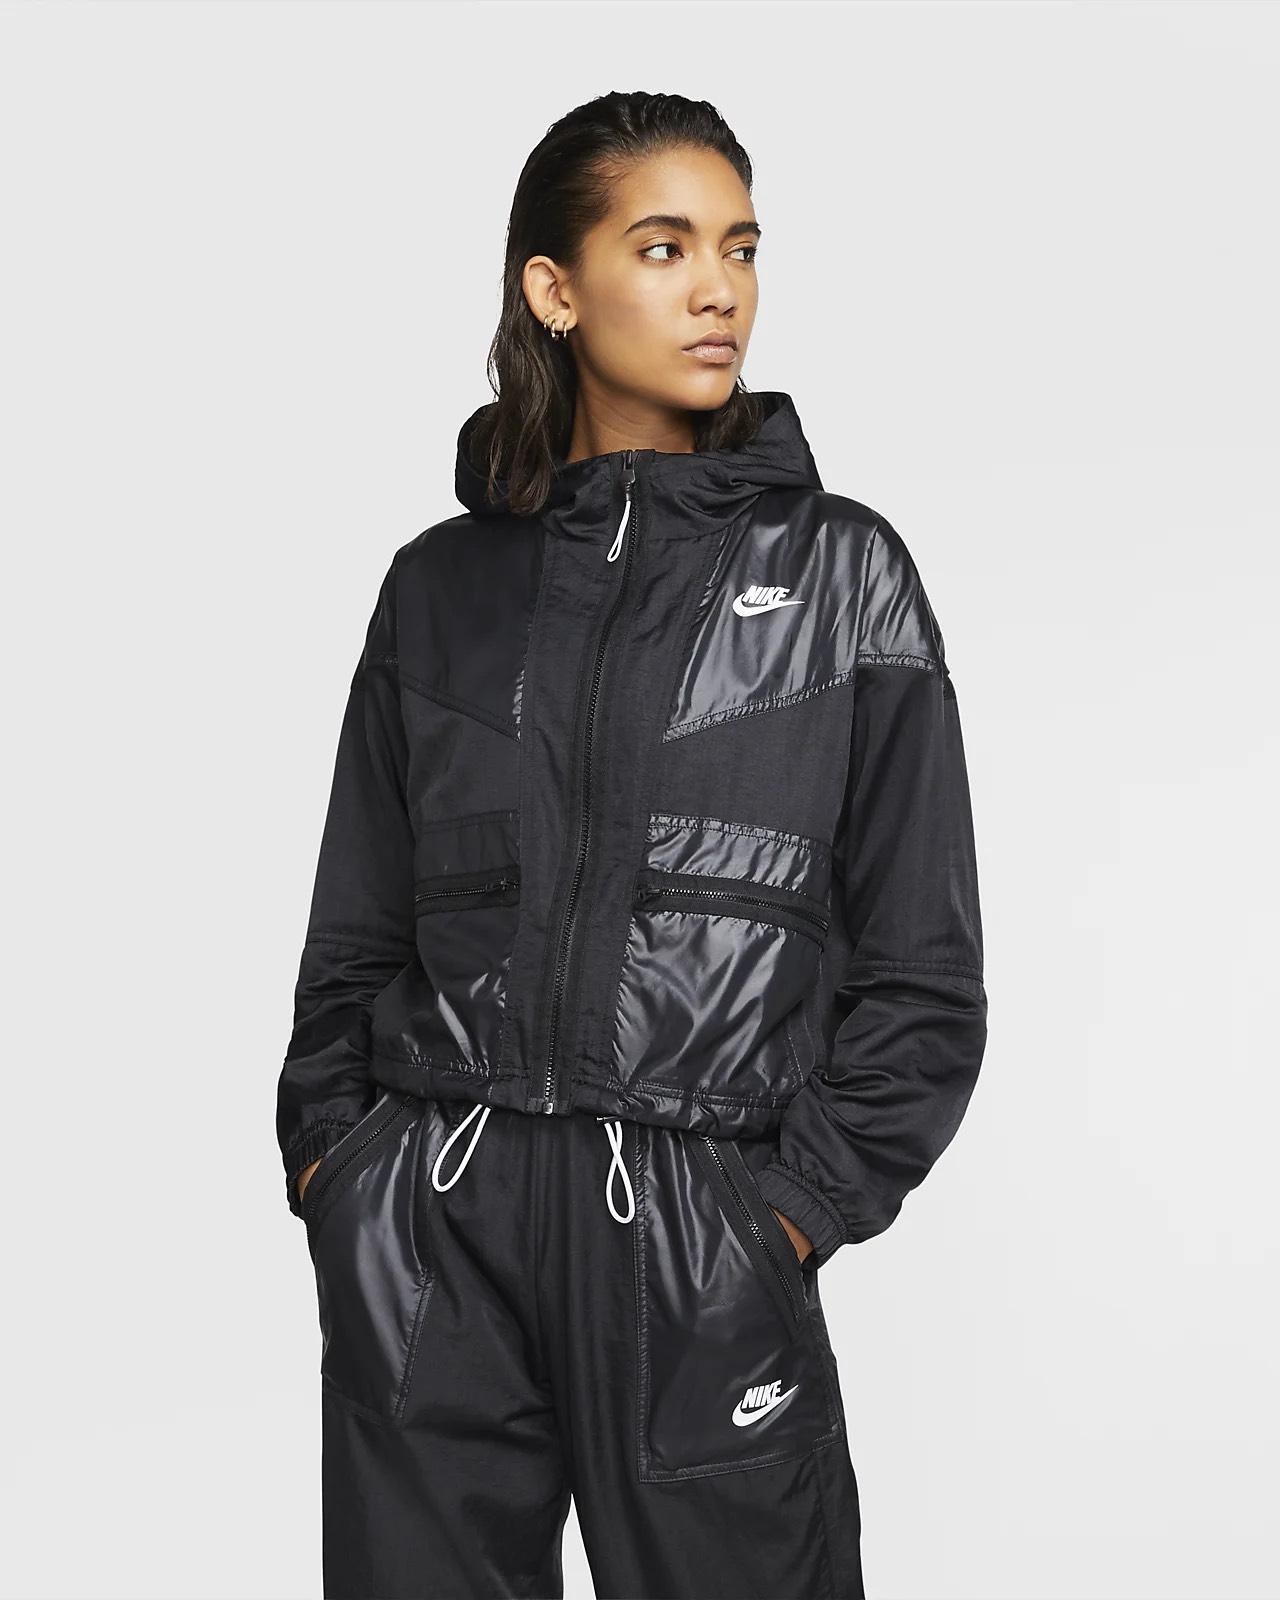 Veste femme cargo Nike Sportswear Windrunner